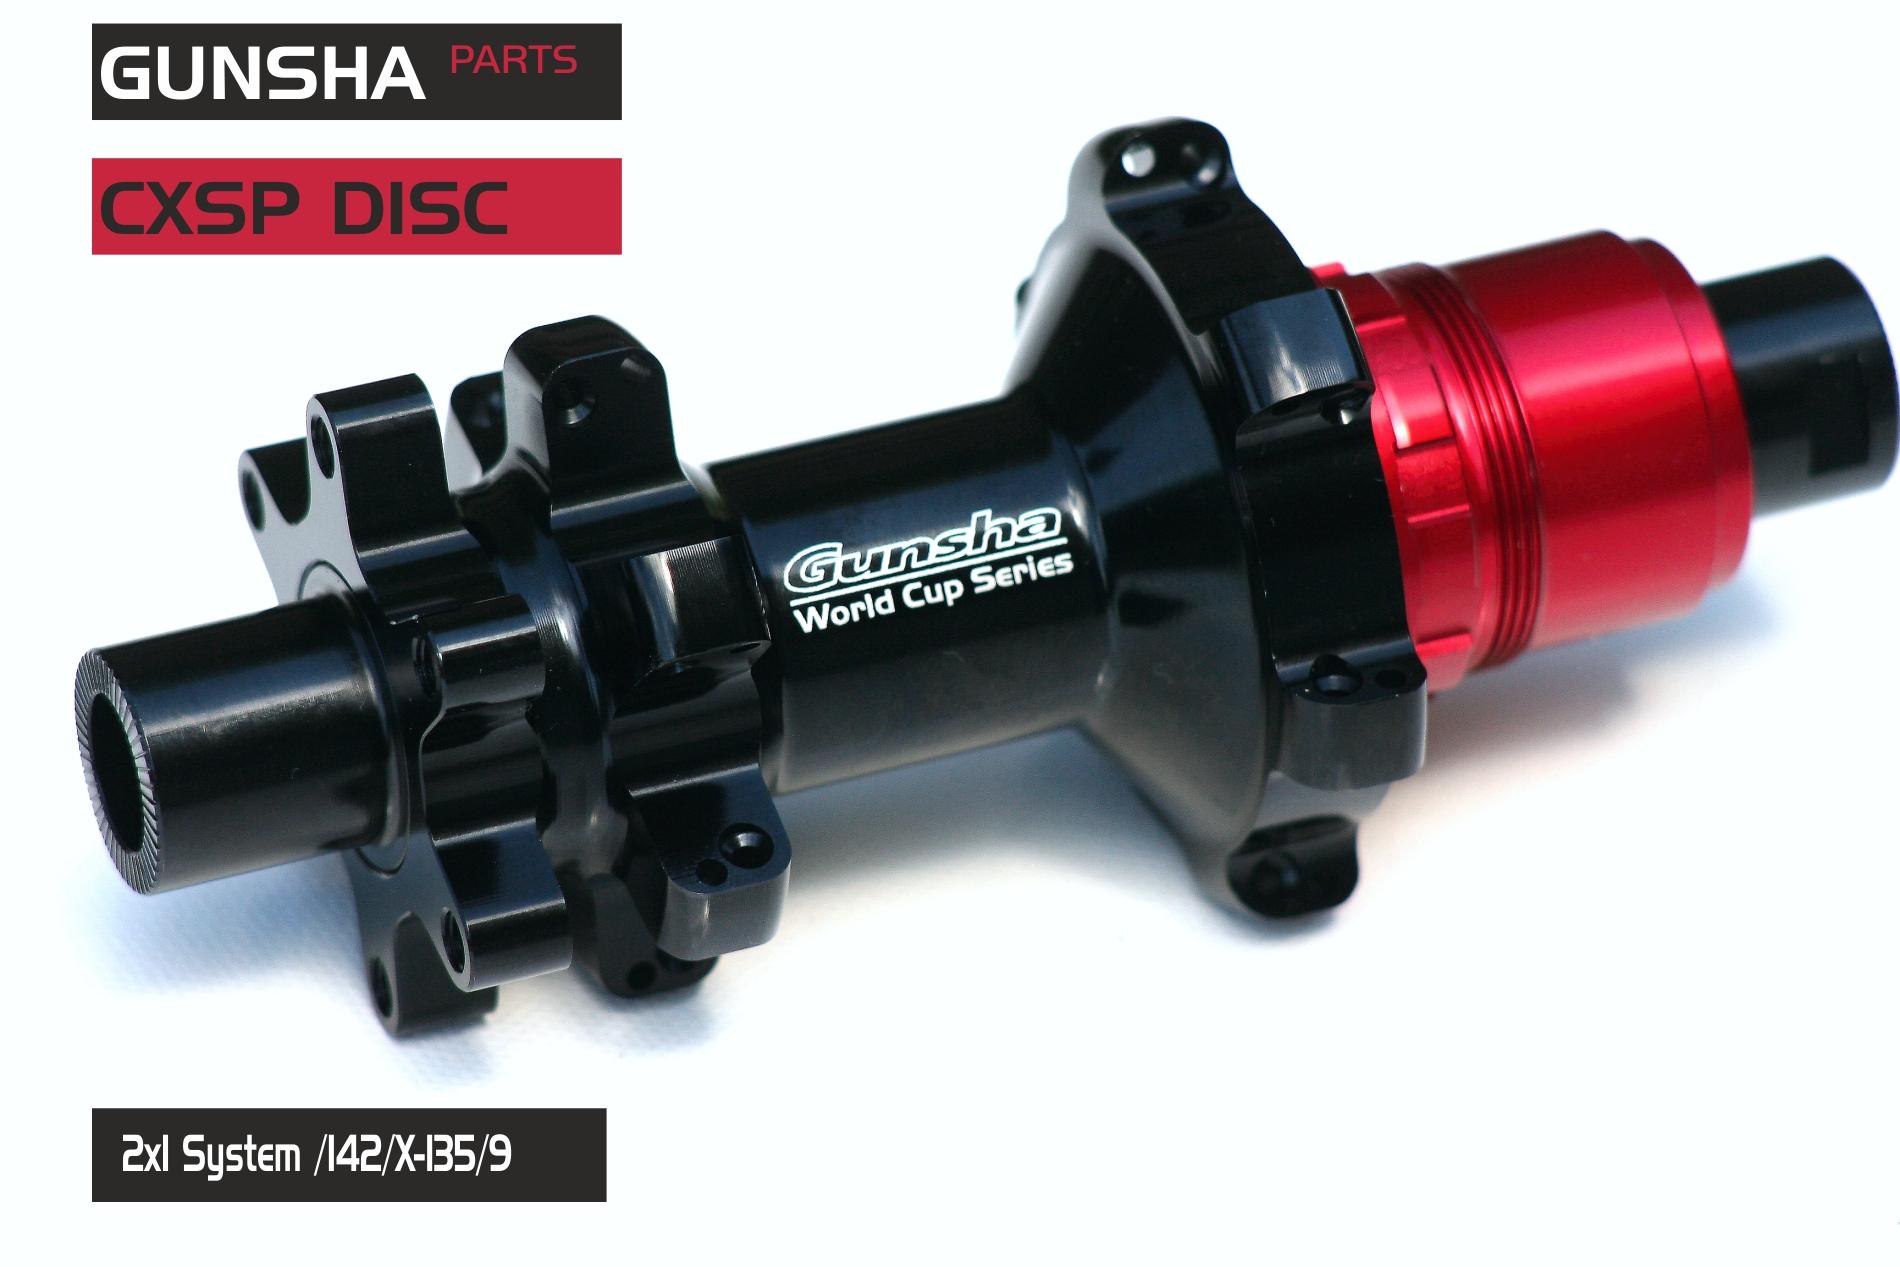 Gunsha HR Nabe CXSP Straightpull (2x1 System)